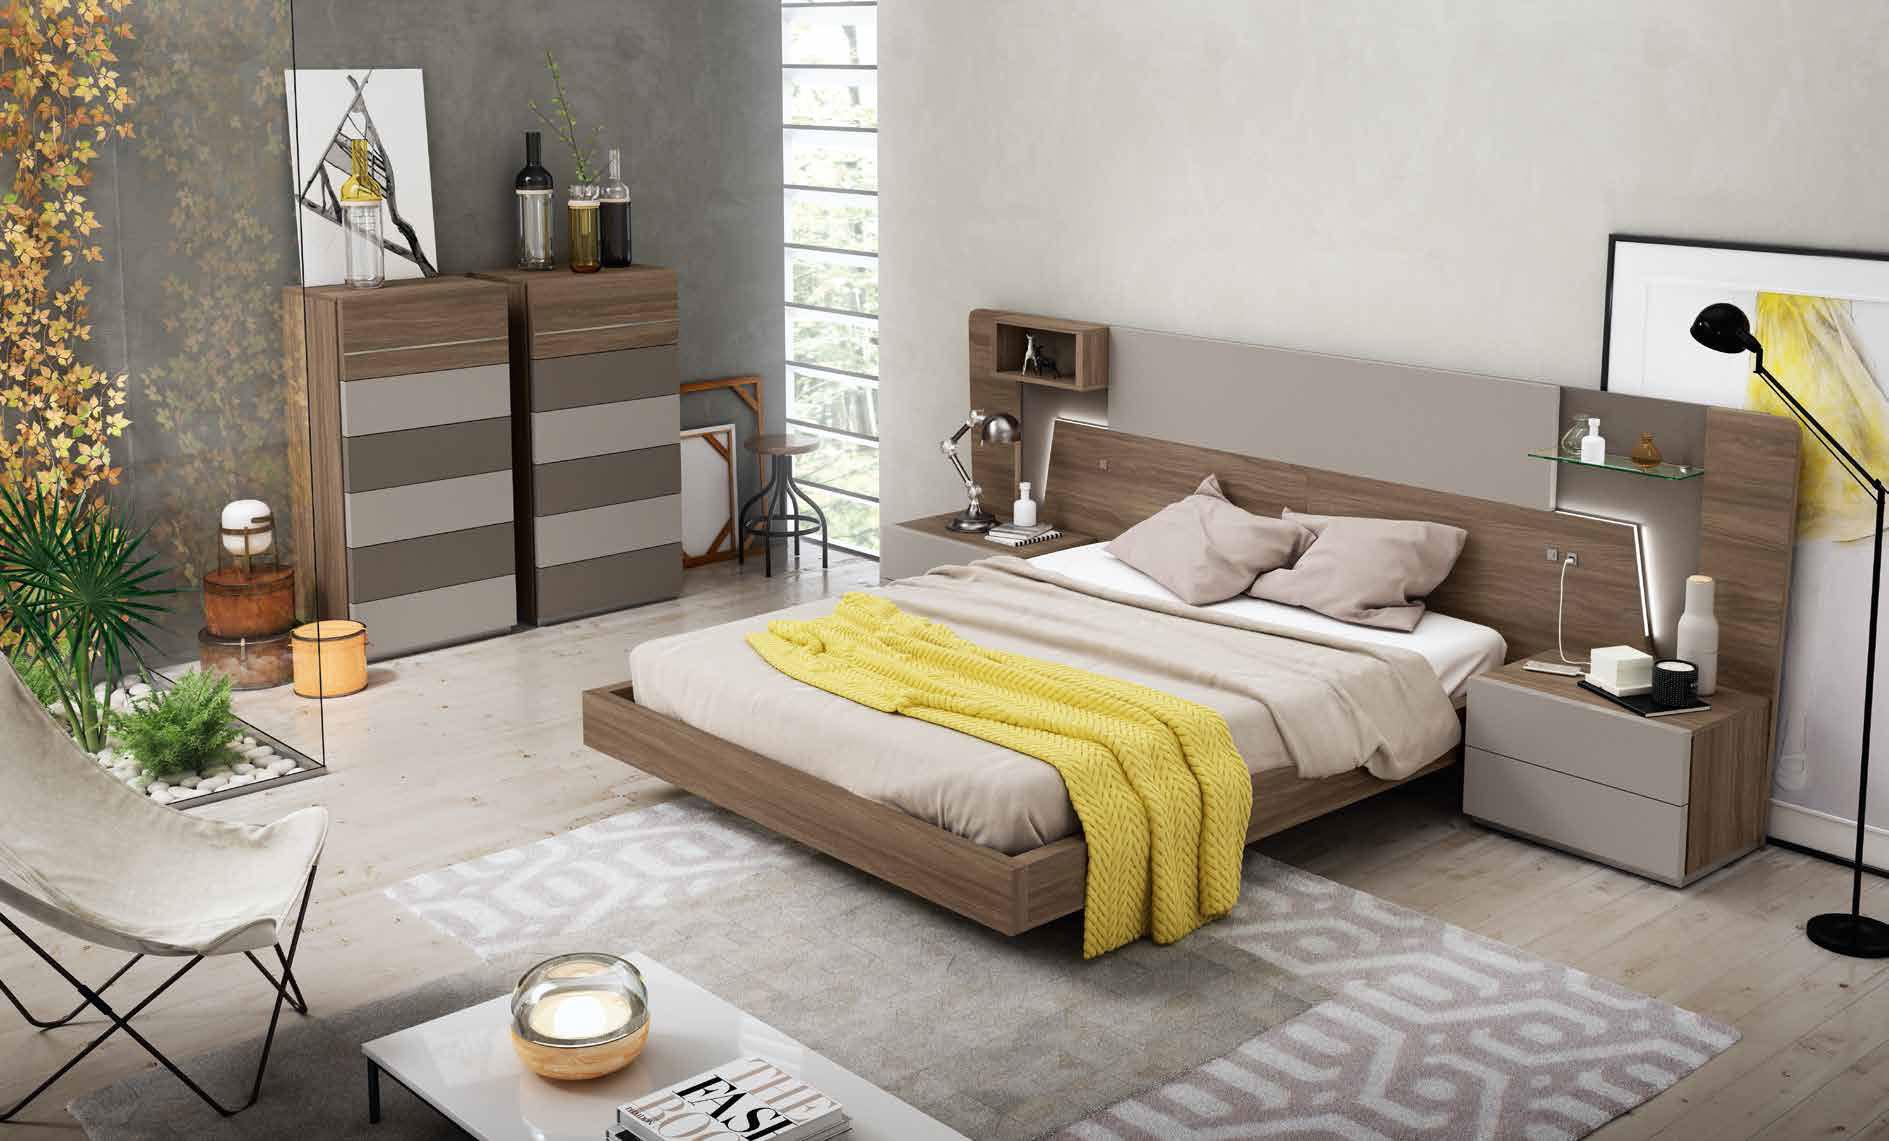 creta-dormitorio-regio-15